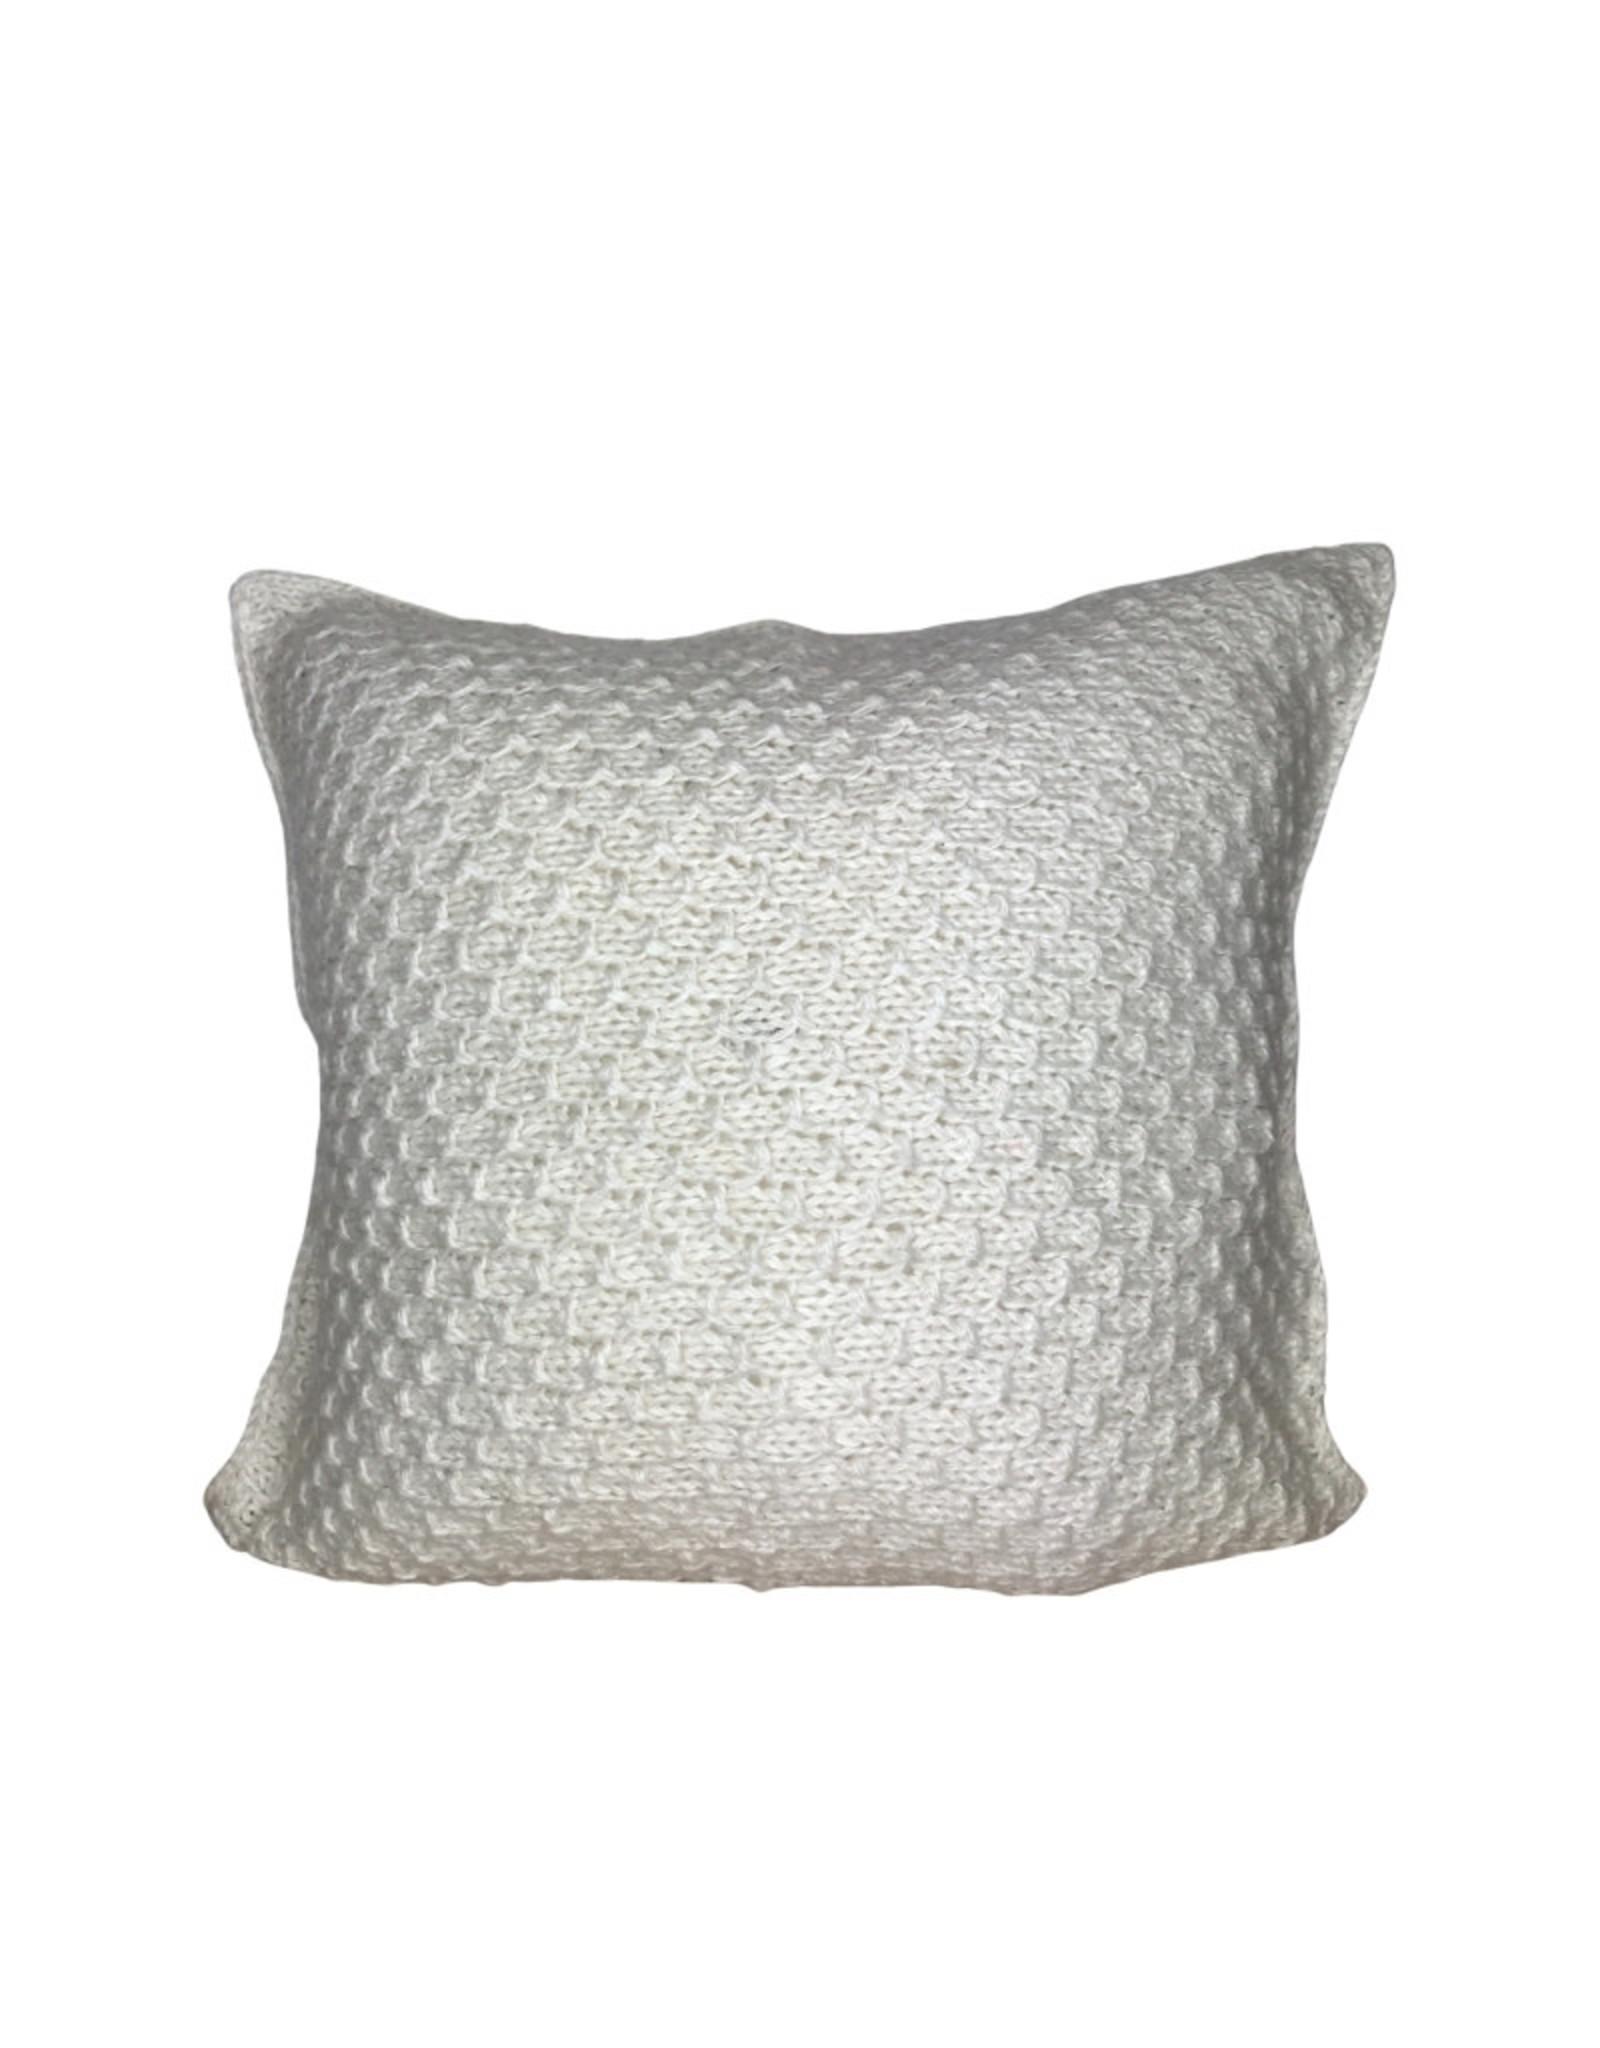 Ten Thousand Villages Cushion Nat Jamuna Stitch Banana Fiber/Wool